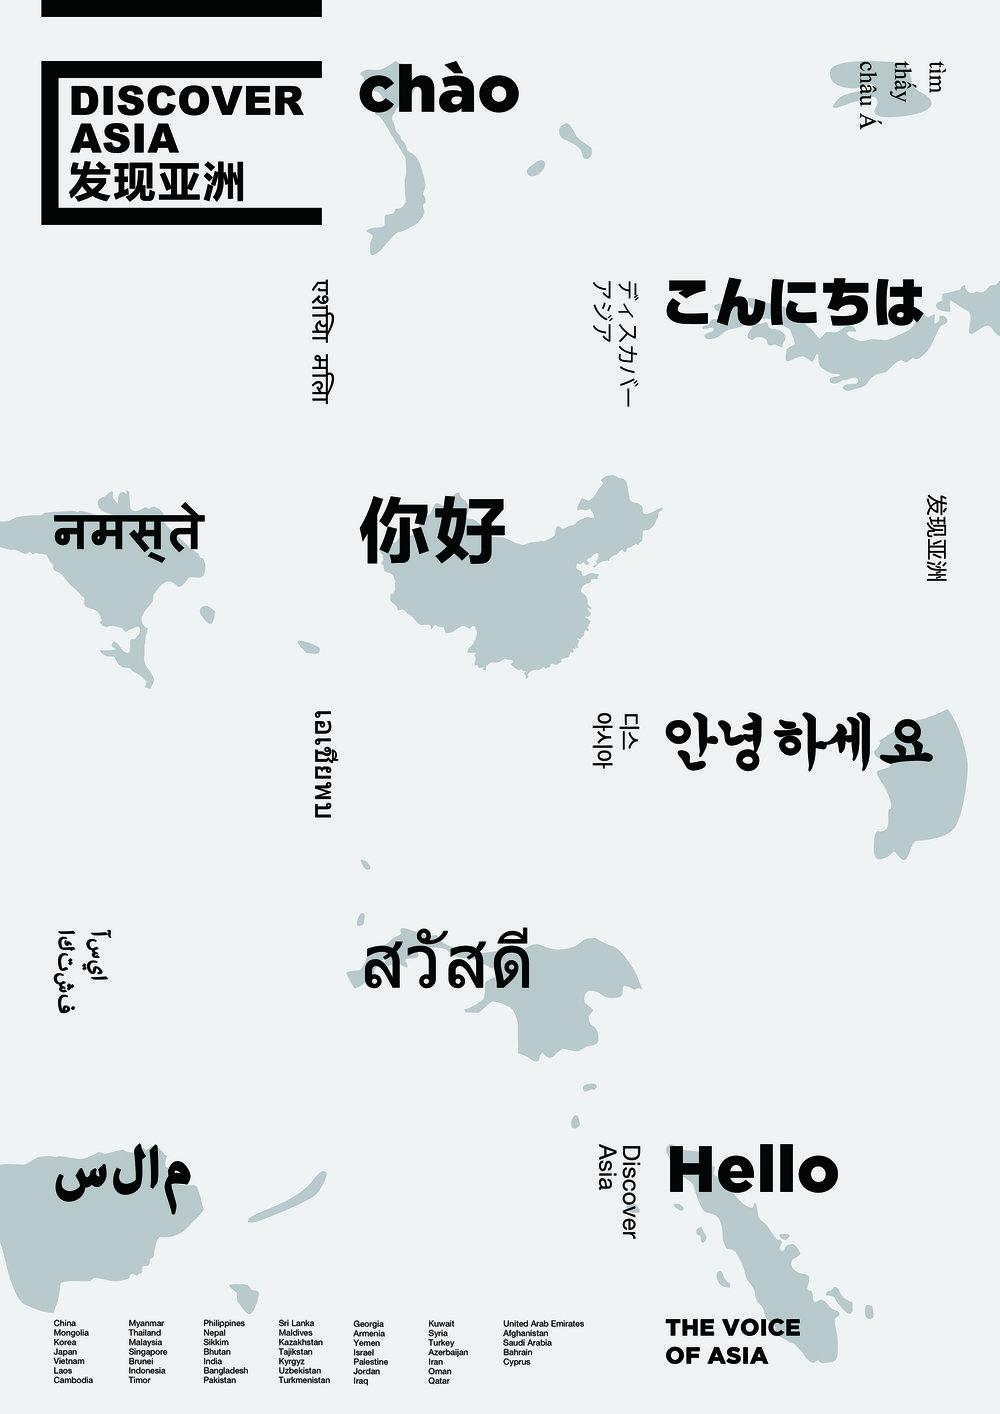 THE VOICE OF ASIA-王晓濛.jpg